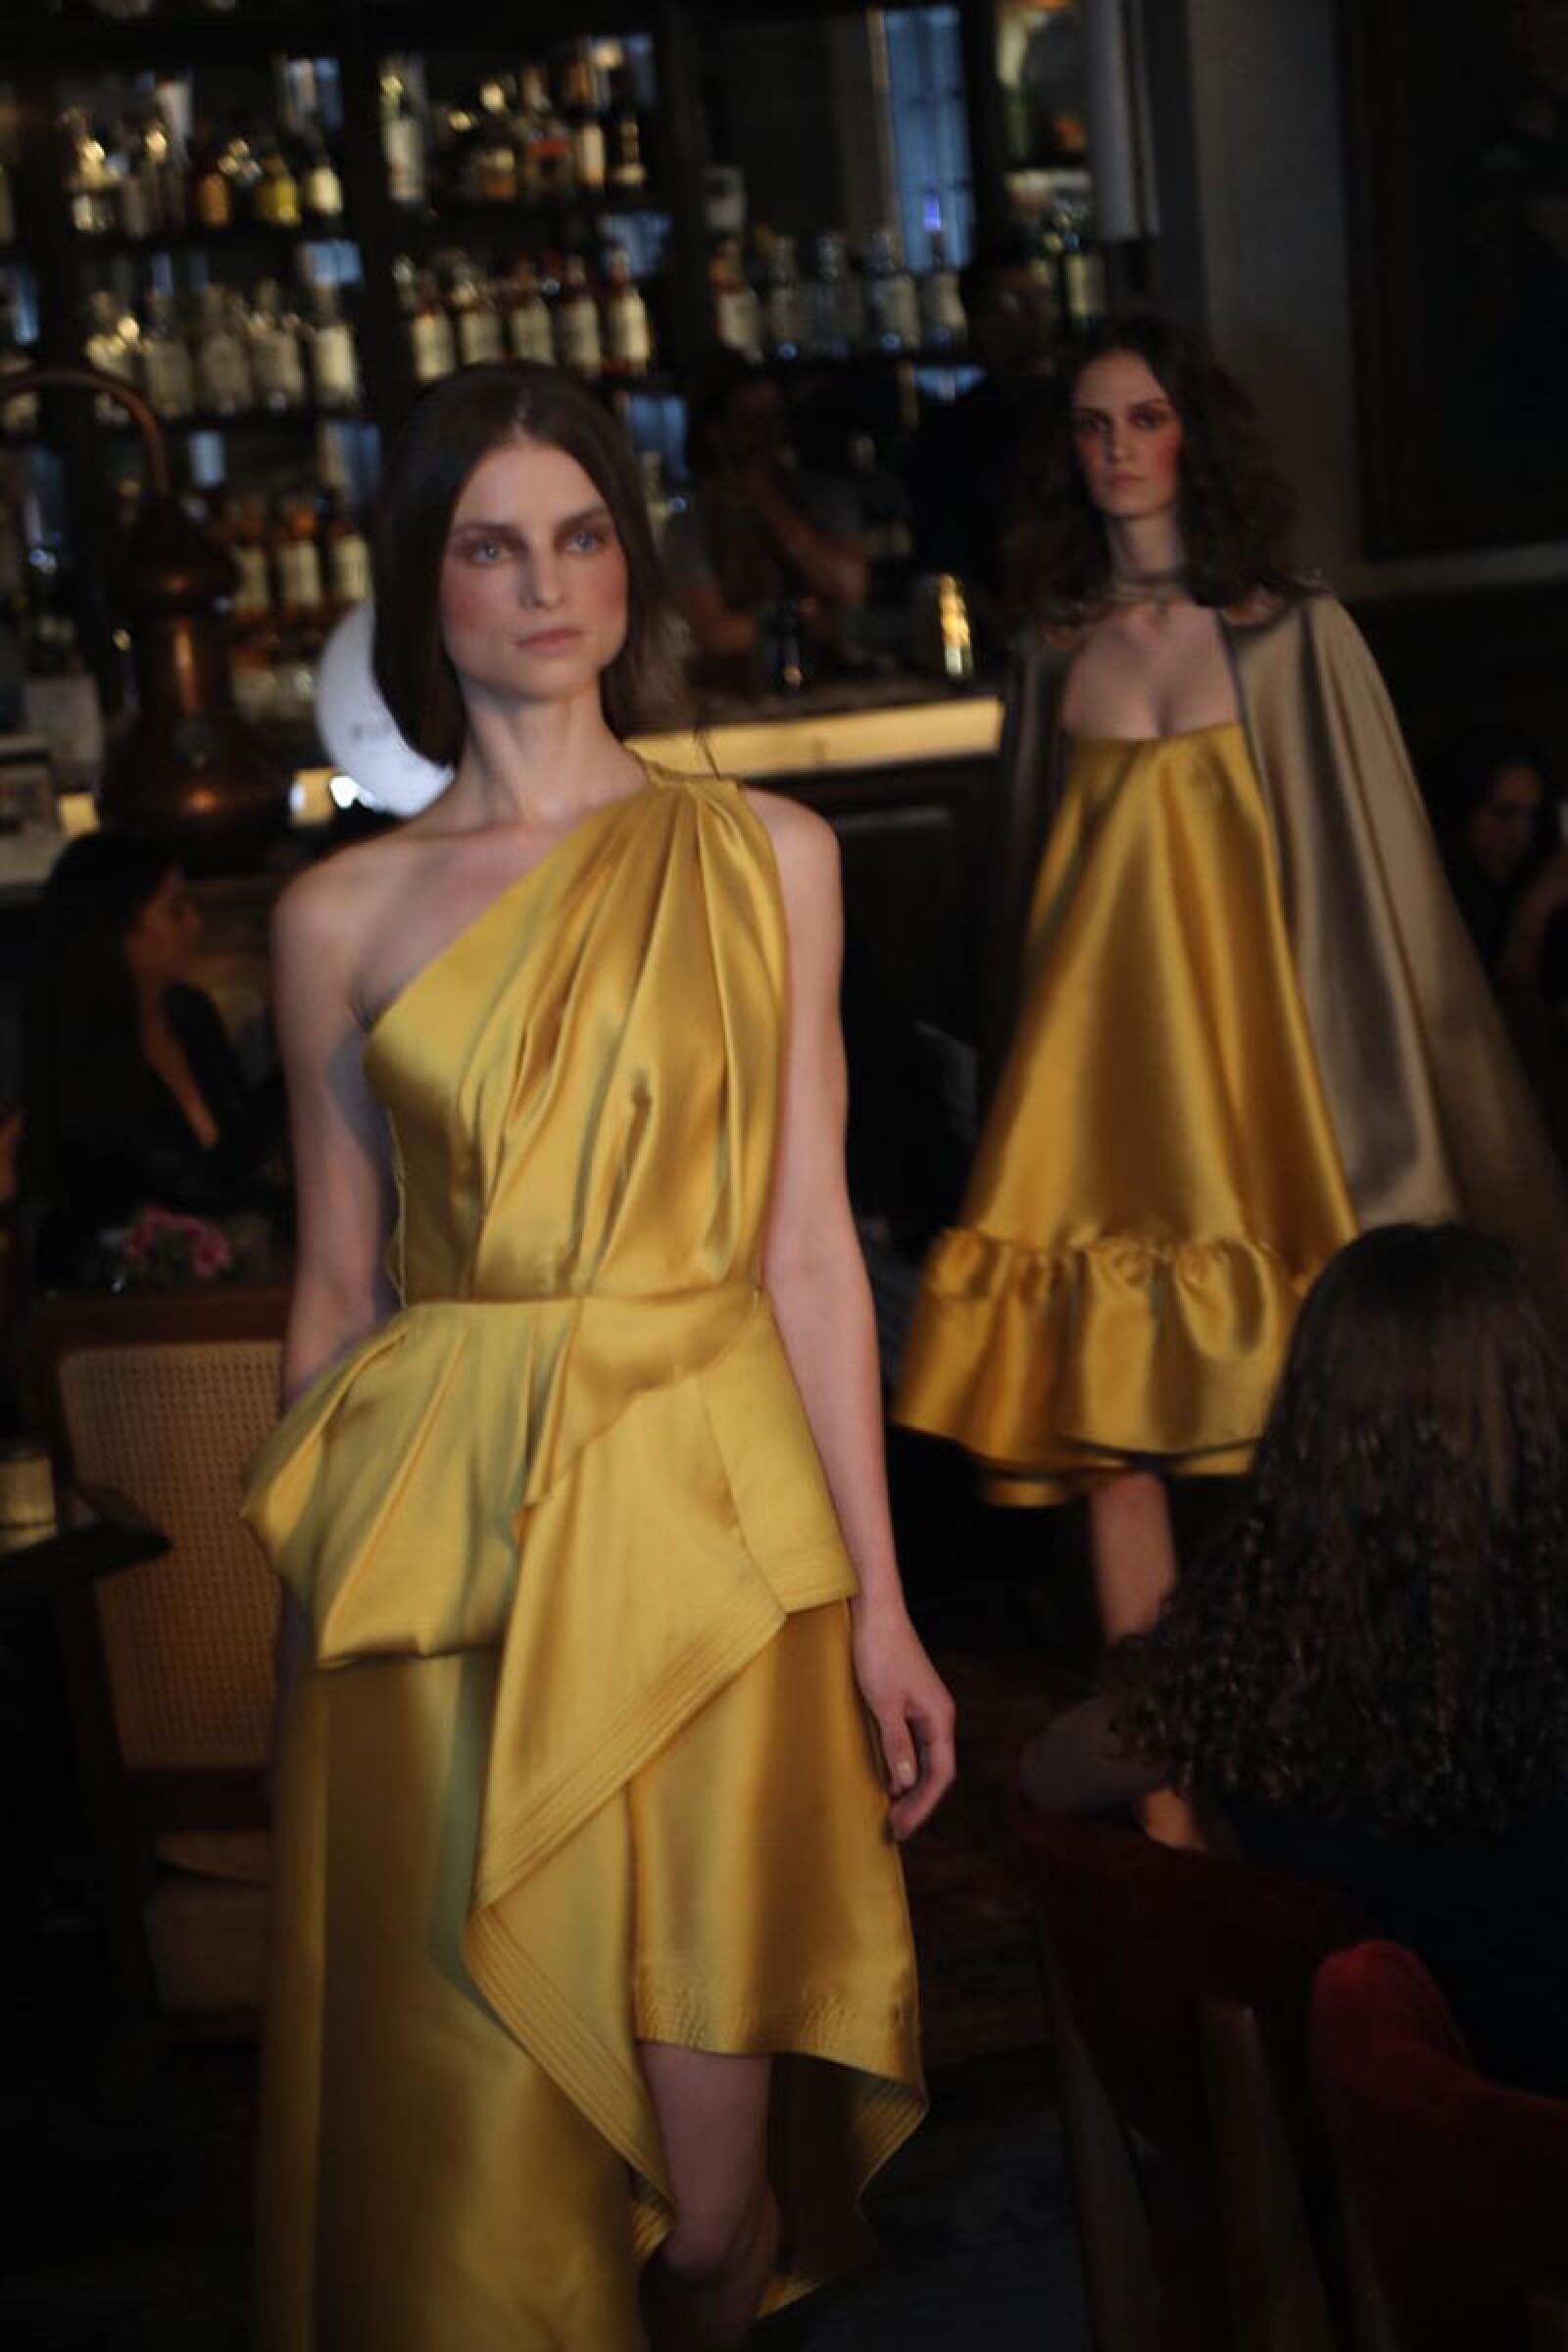 Sandra-Weil-MBFWM-Runway-Yellow-Dress-look